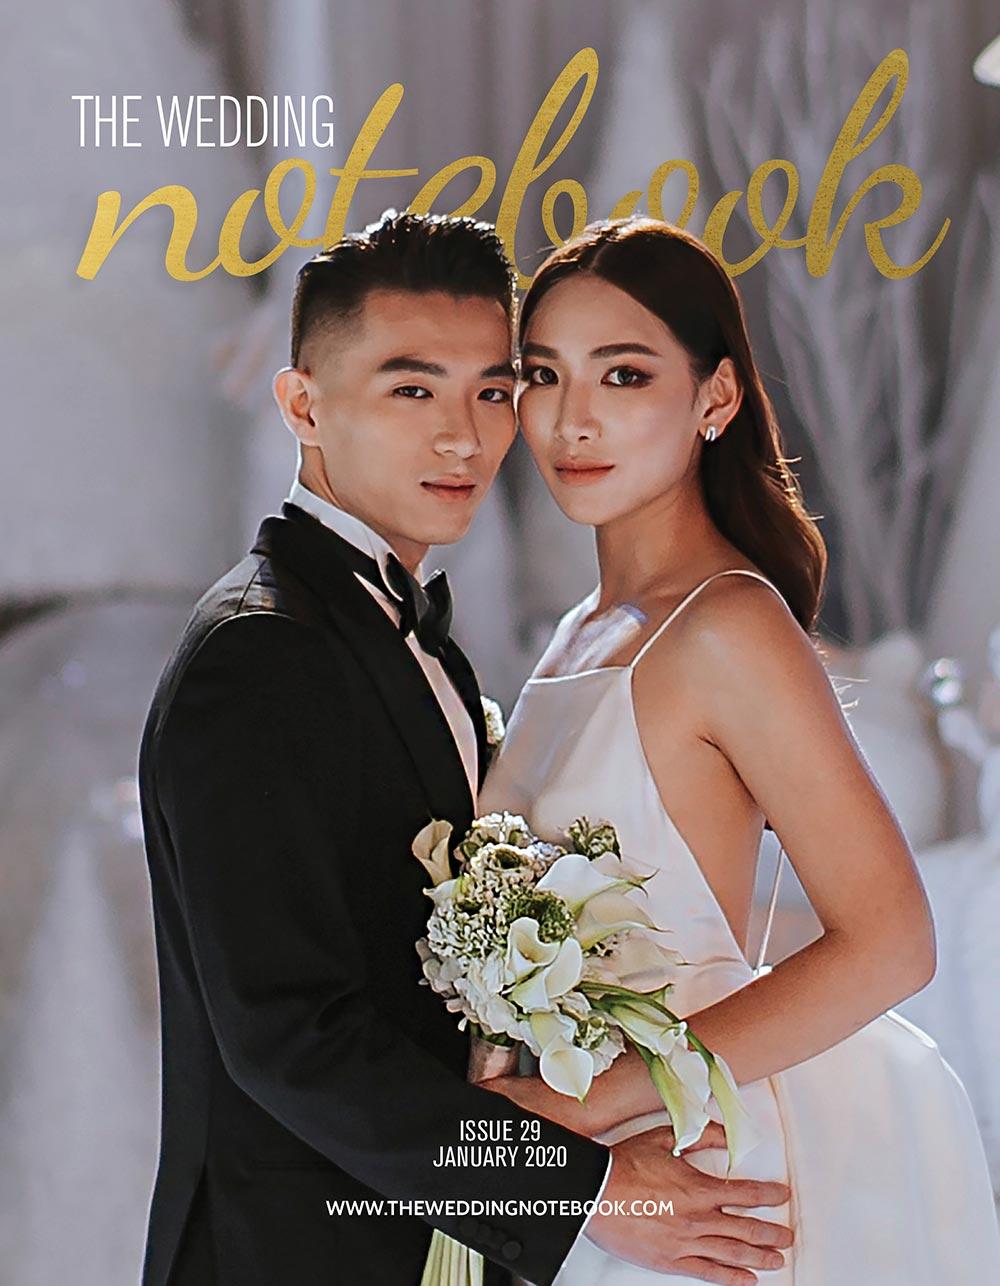 The Wedding Notebook magazine issue 29